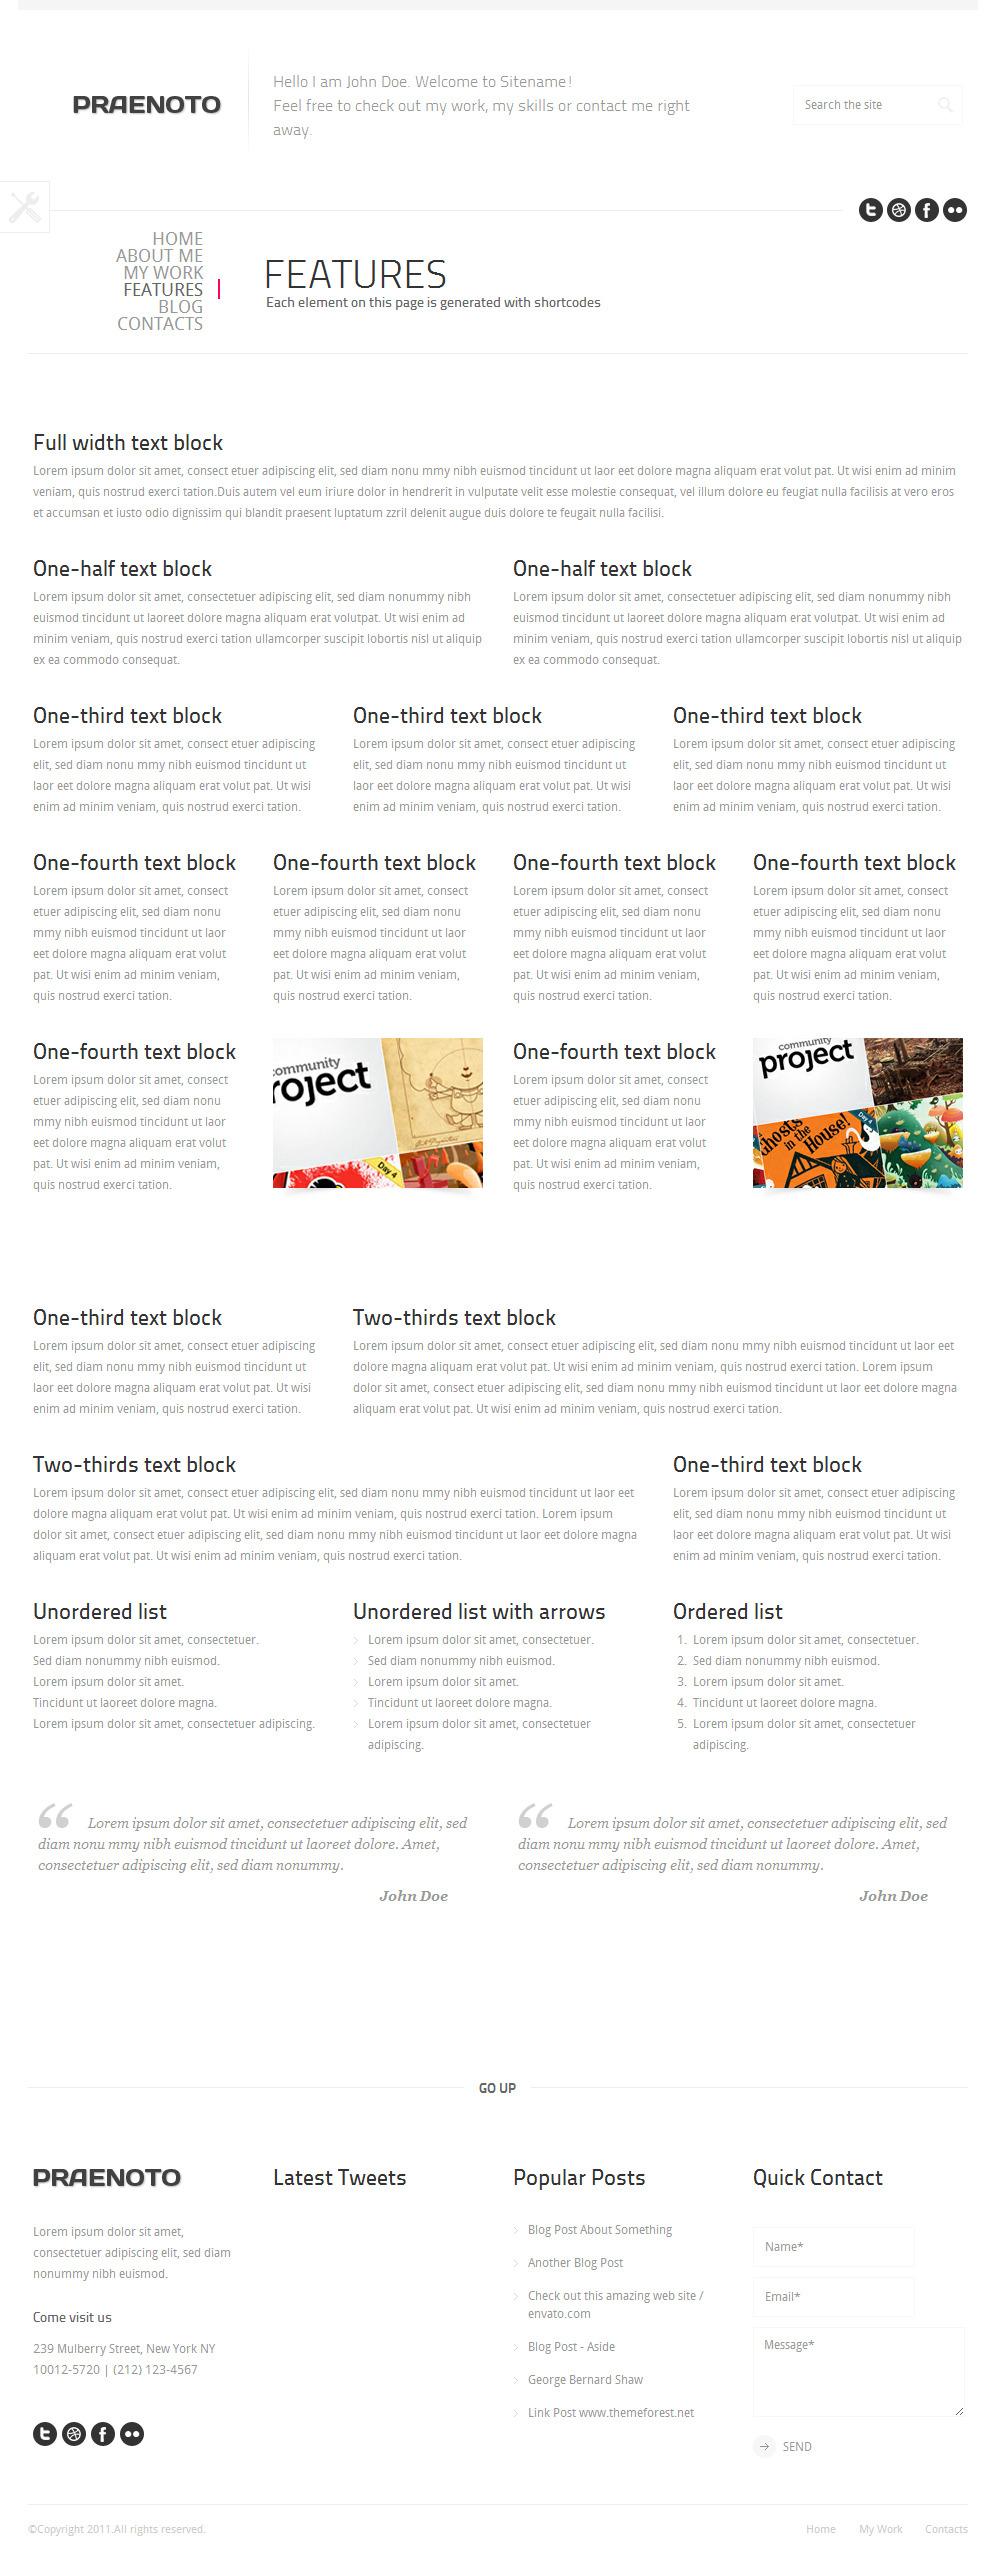 Praenoto - Clean & Minimalist WordPress Theme - Screenshot 13. Layout blocks page.